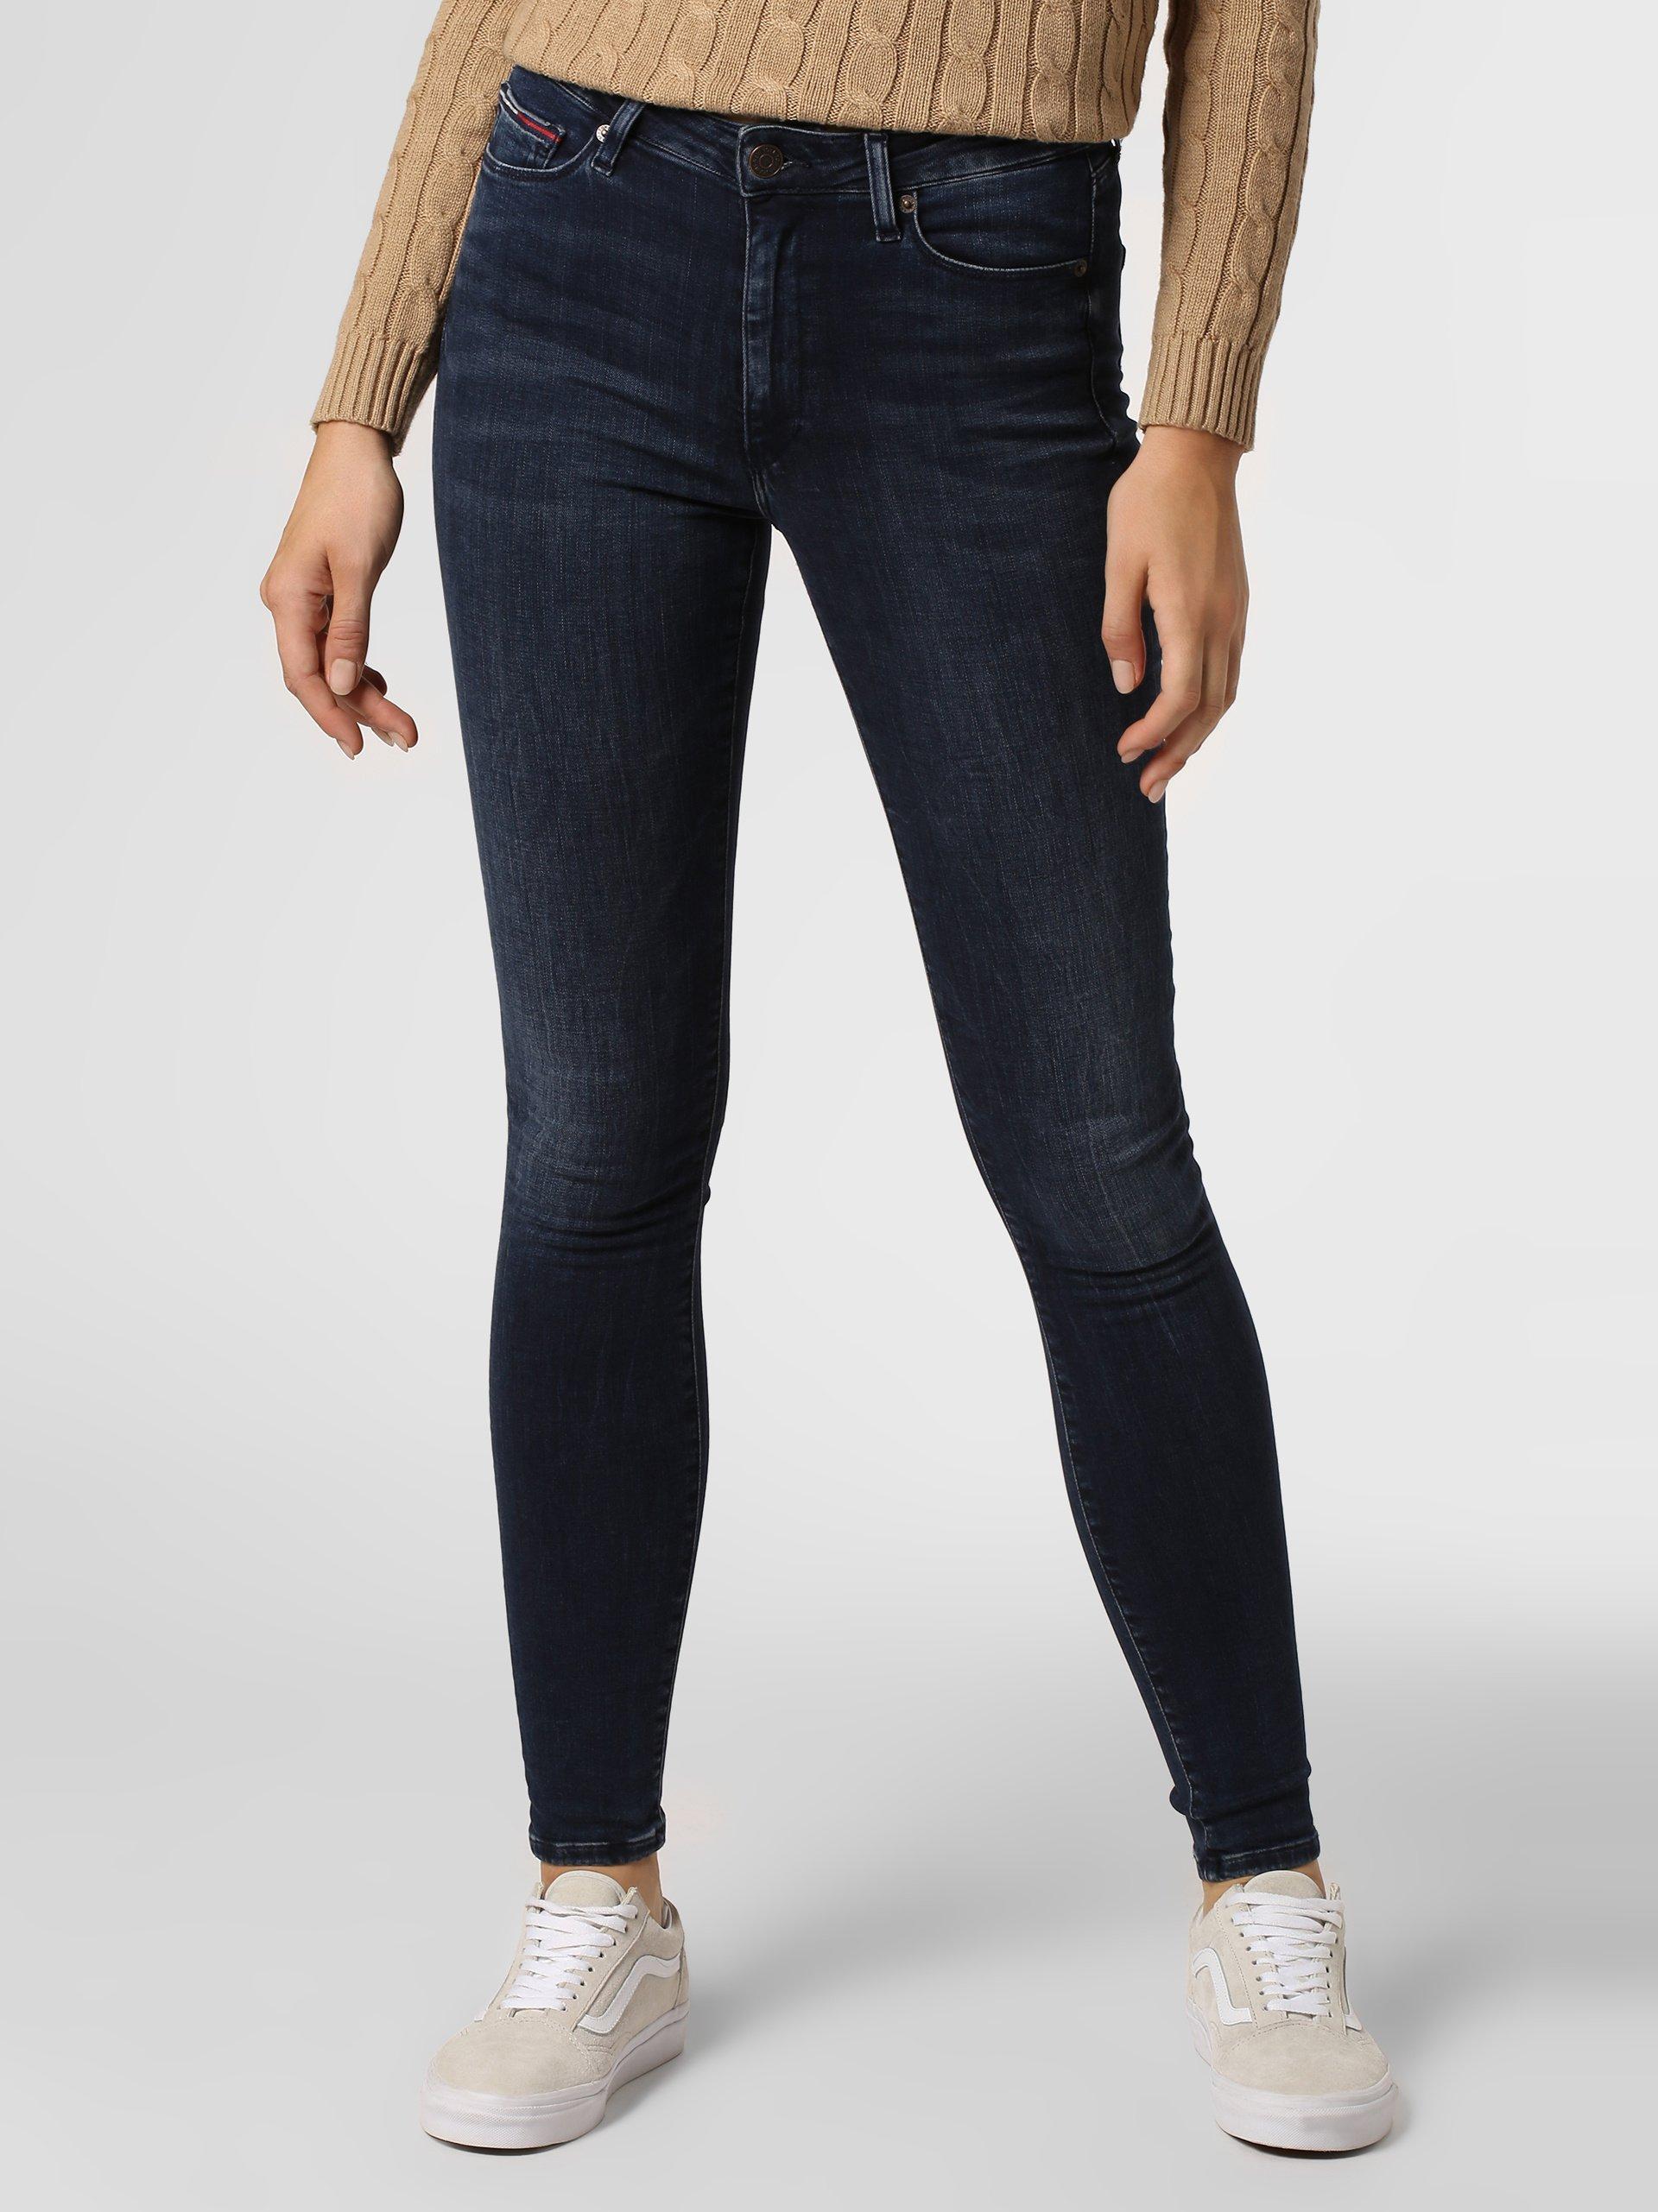 Tommy Jeans Damen Jeans